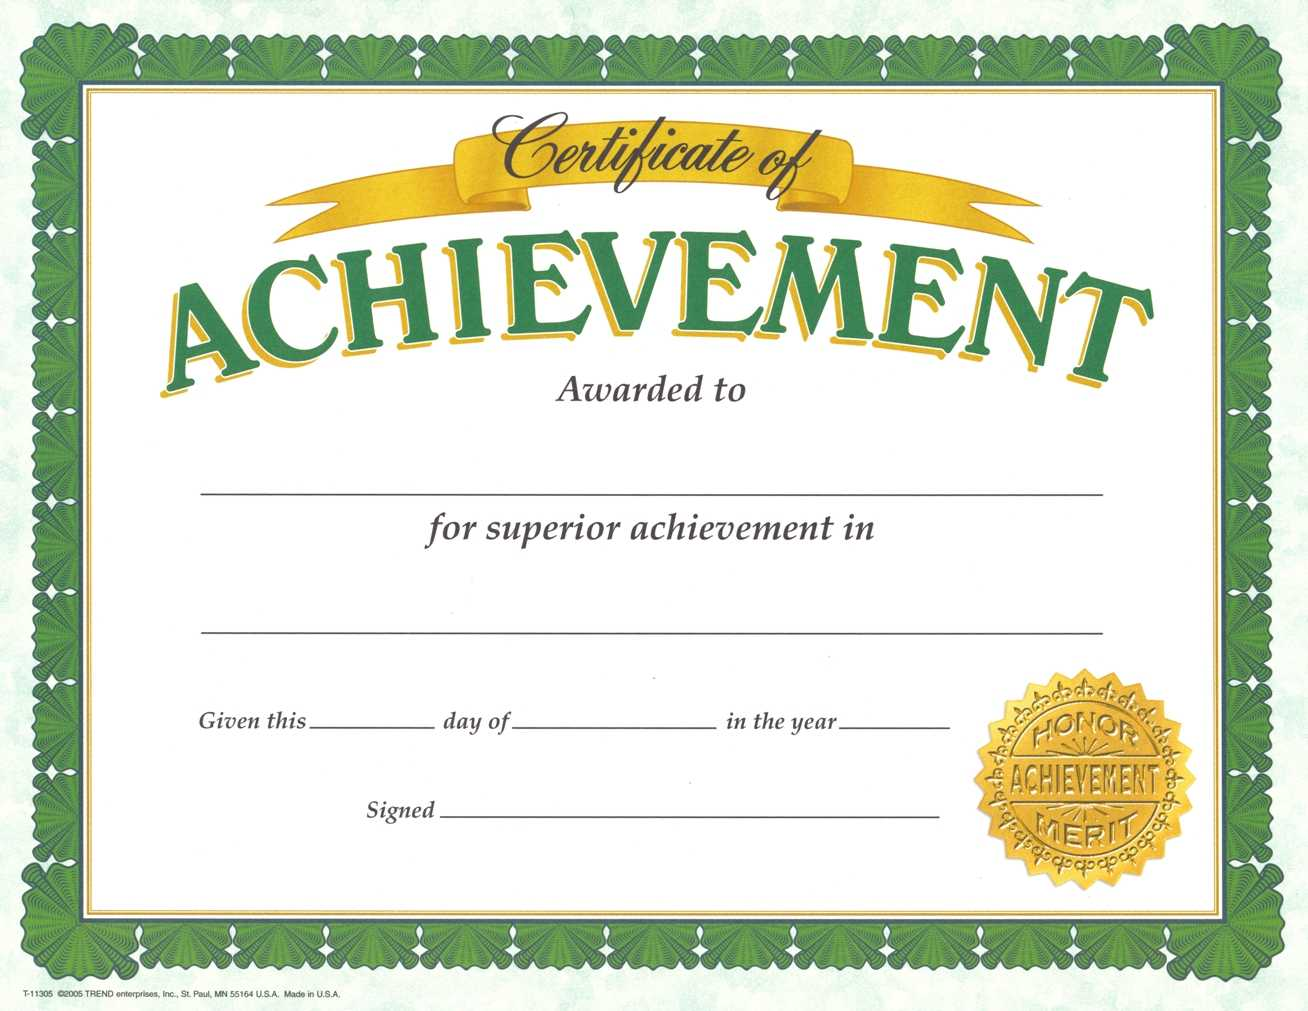 Certificate Of Achievement Template – Certificate Templates Regarding Certificate Of Achievement Army Template